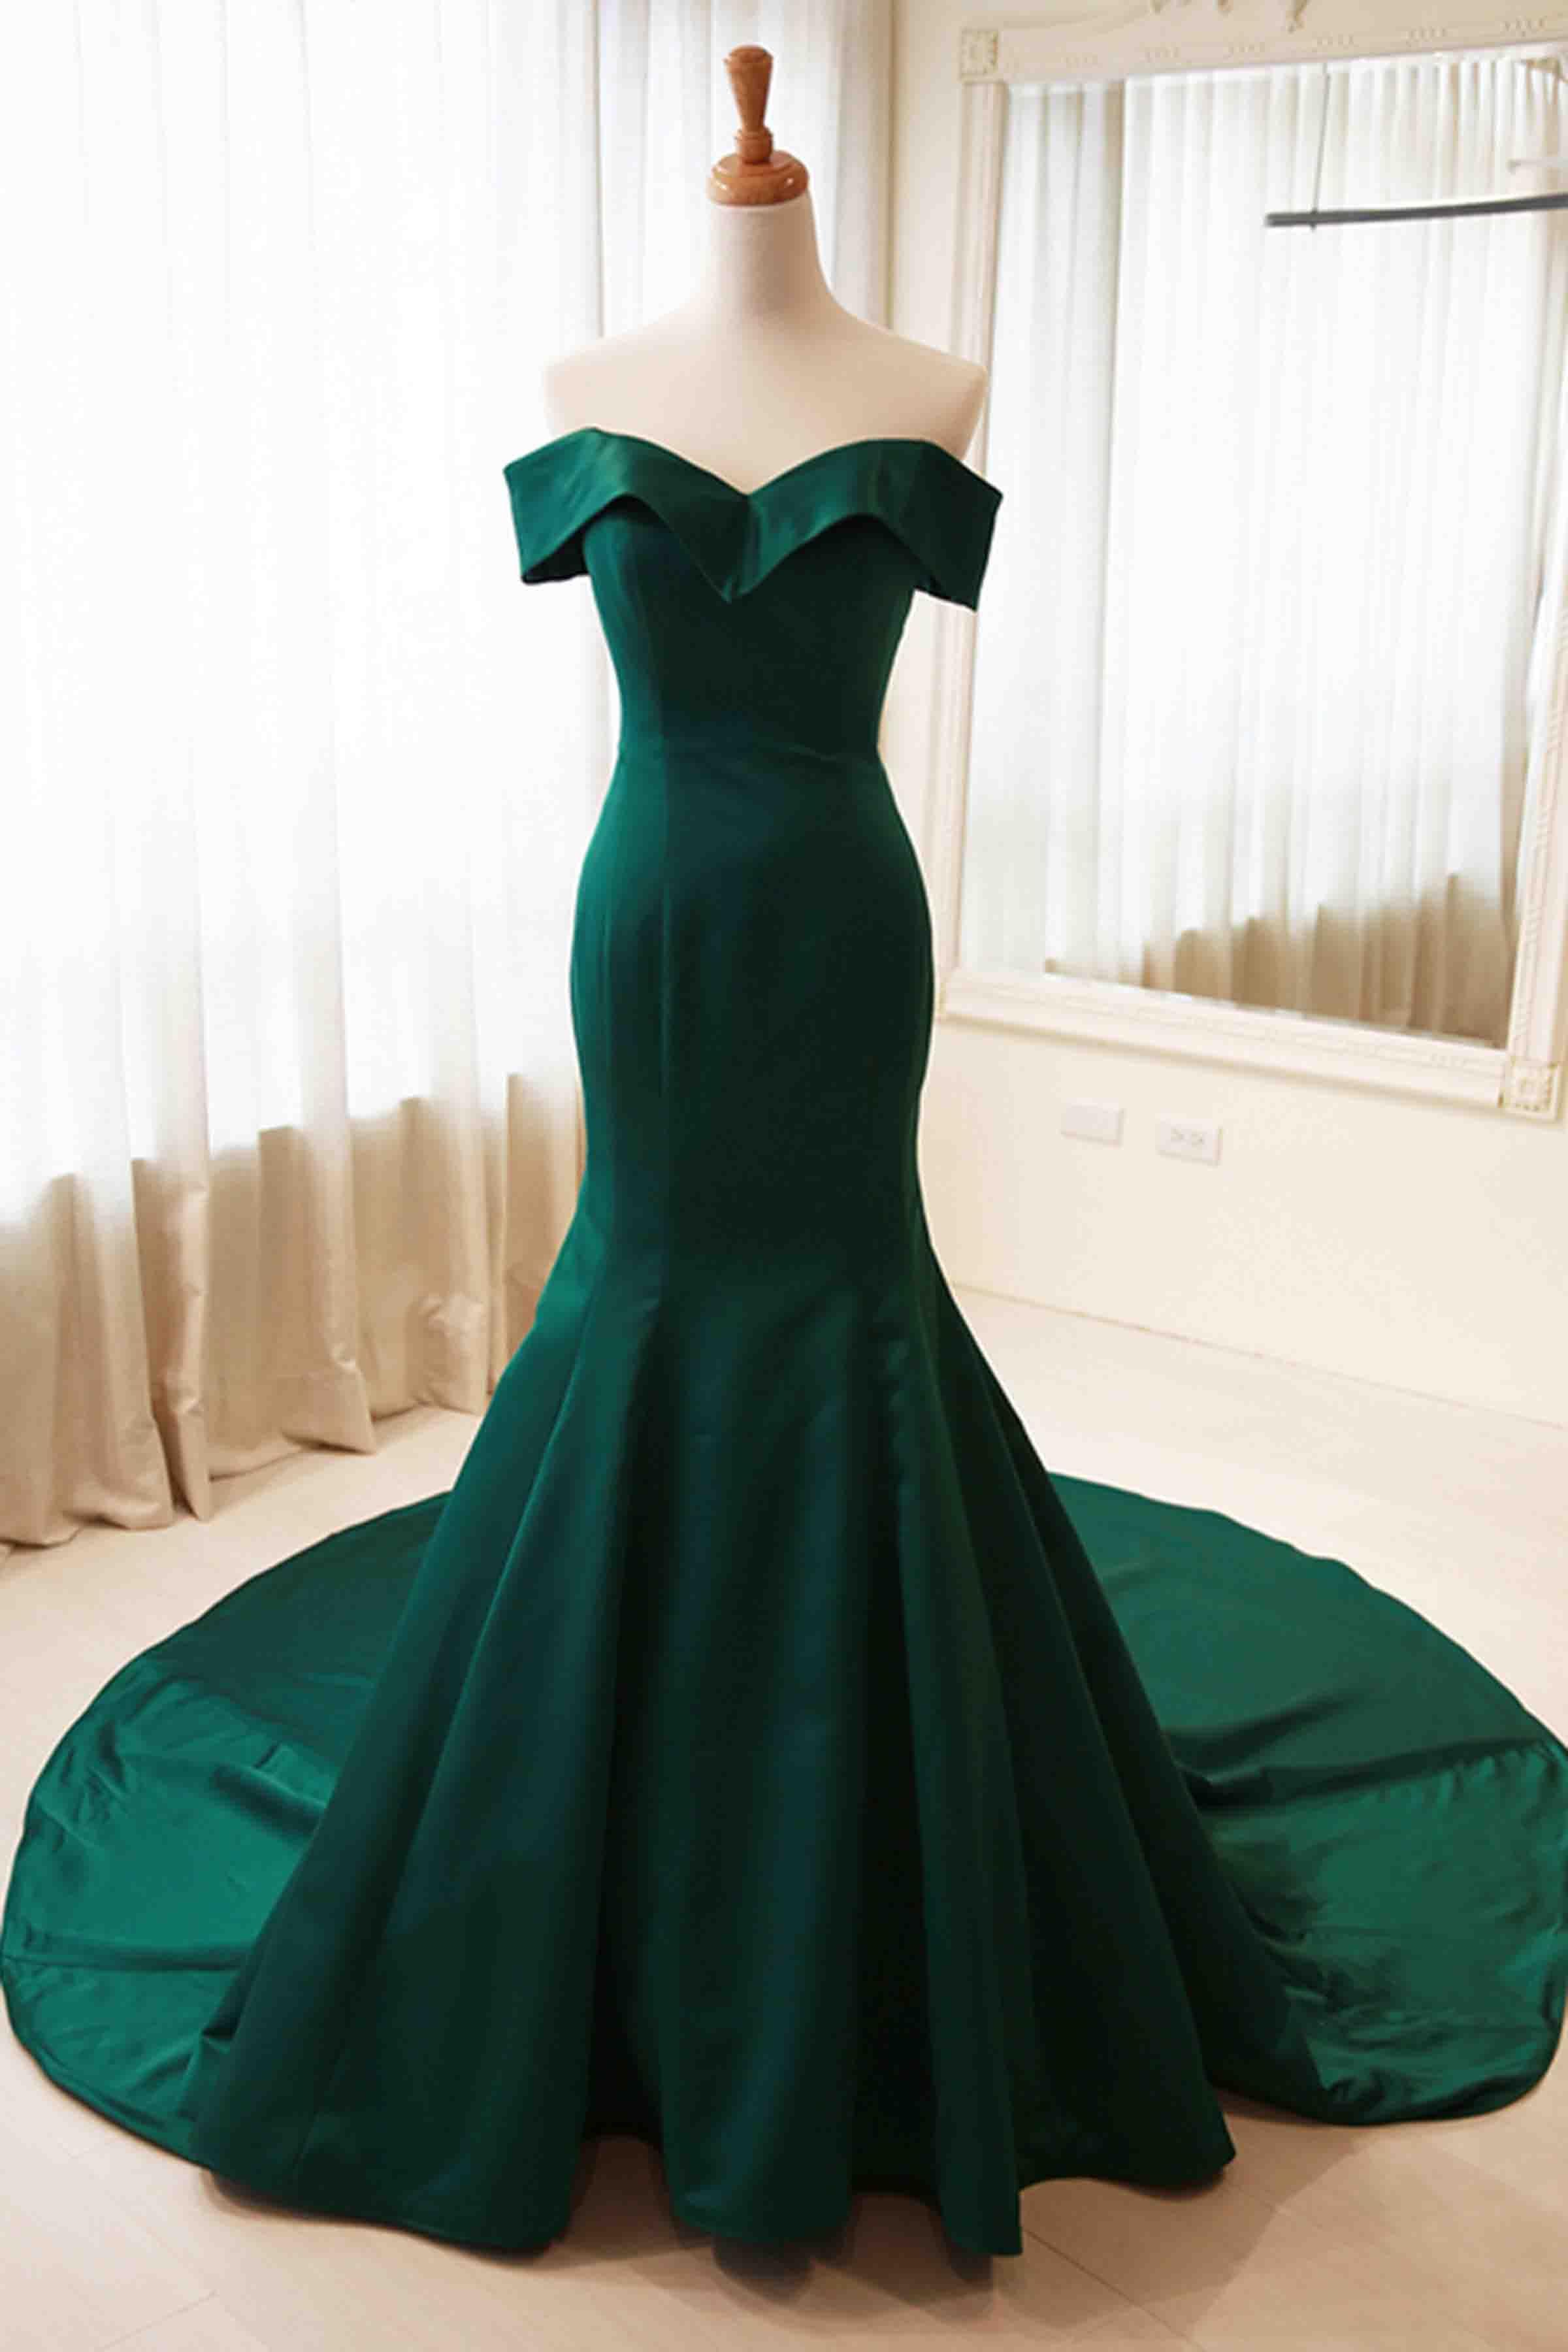 Green satin mermaid prom dress, ball gown, elegant off the shoulder ...